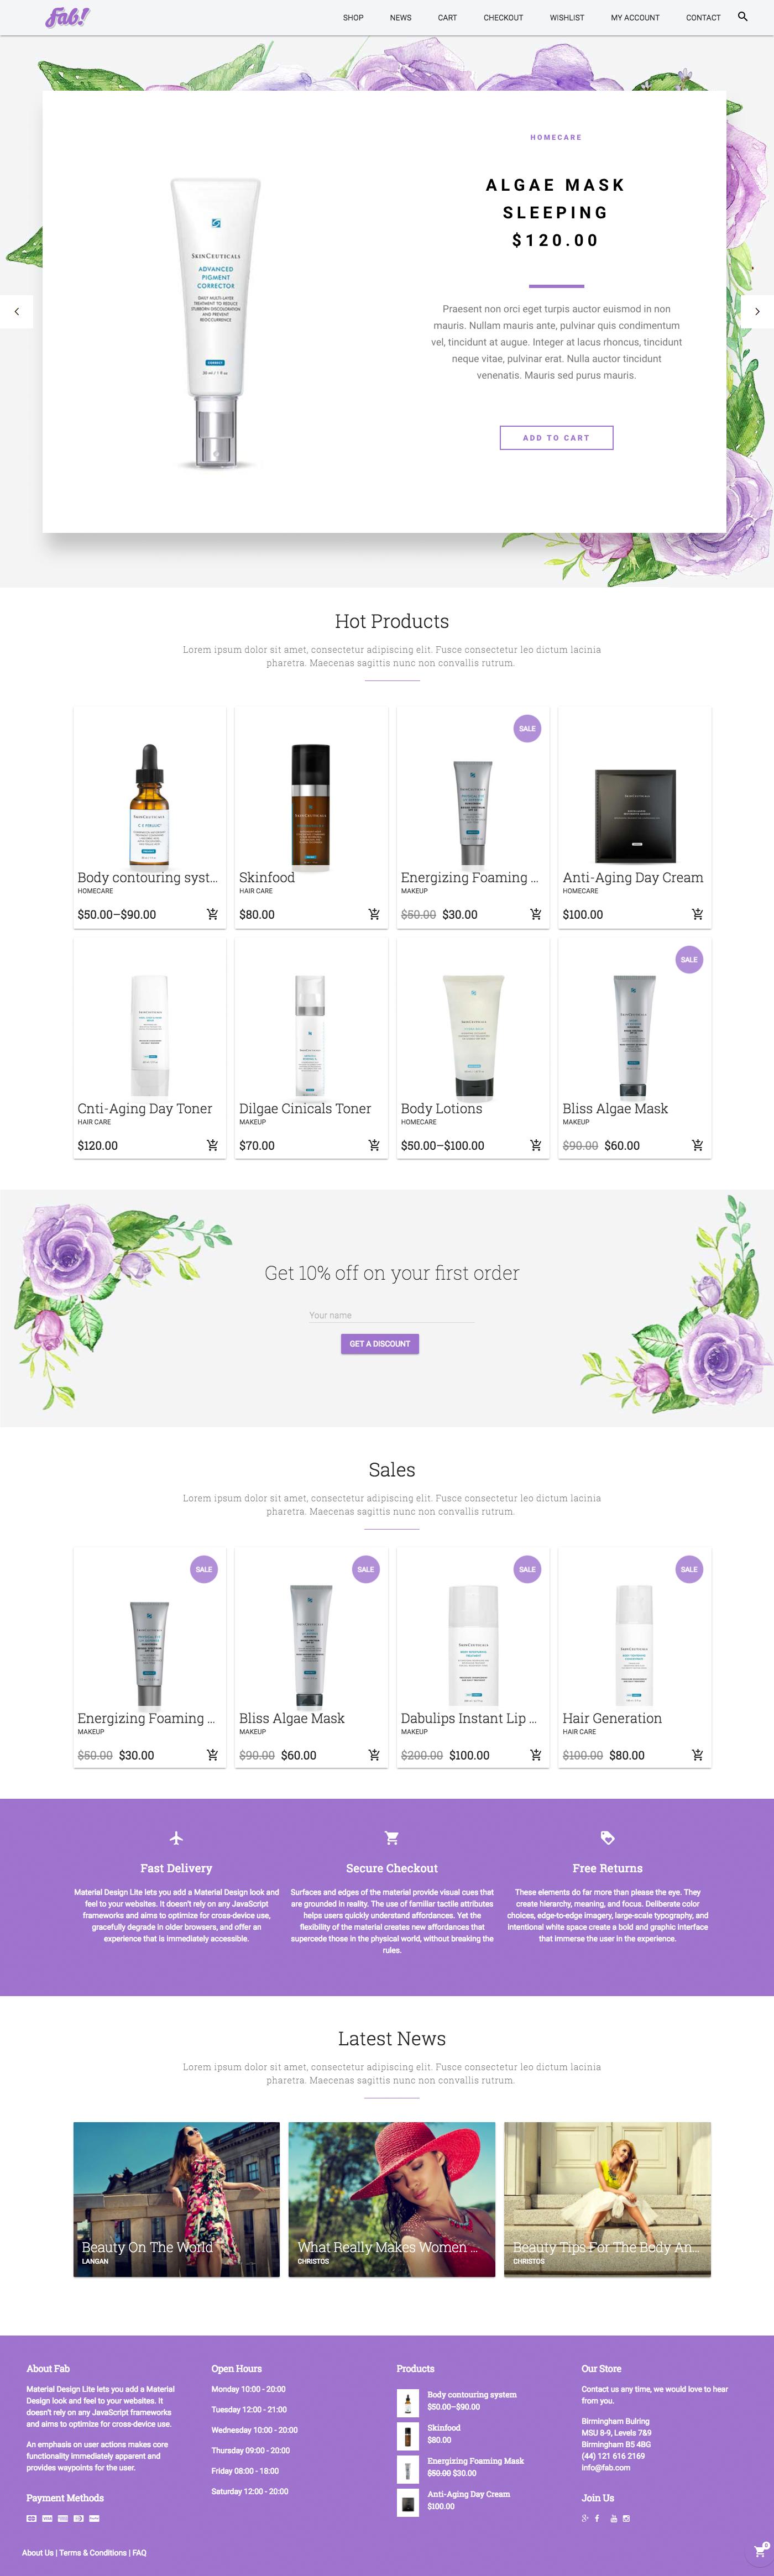 Beauty Products e-Shop